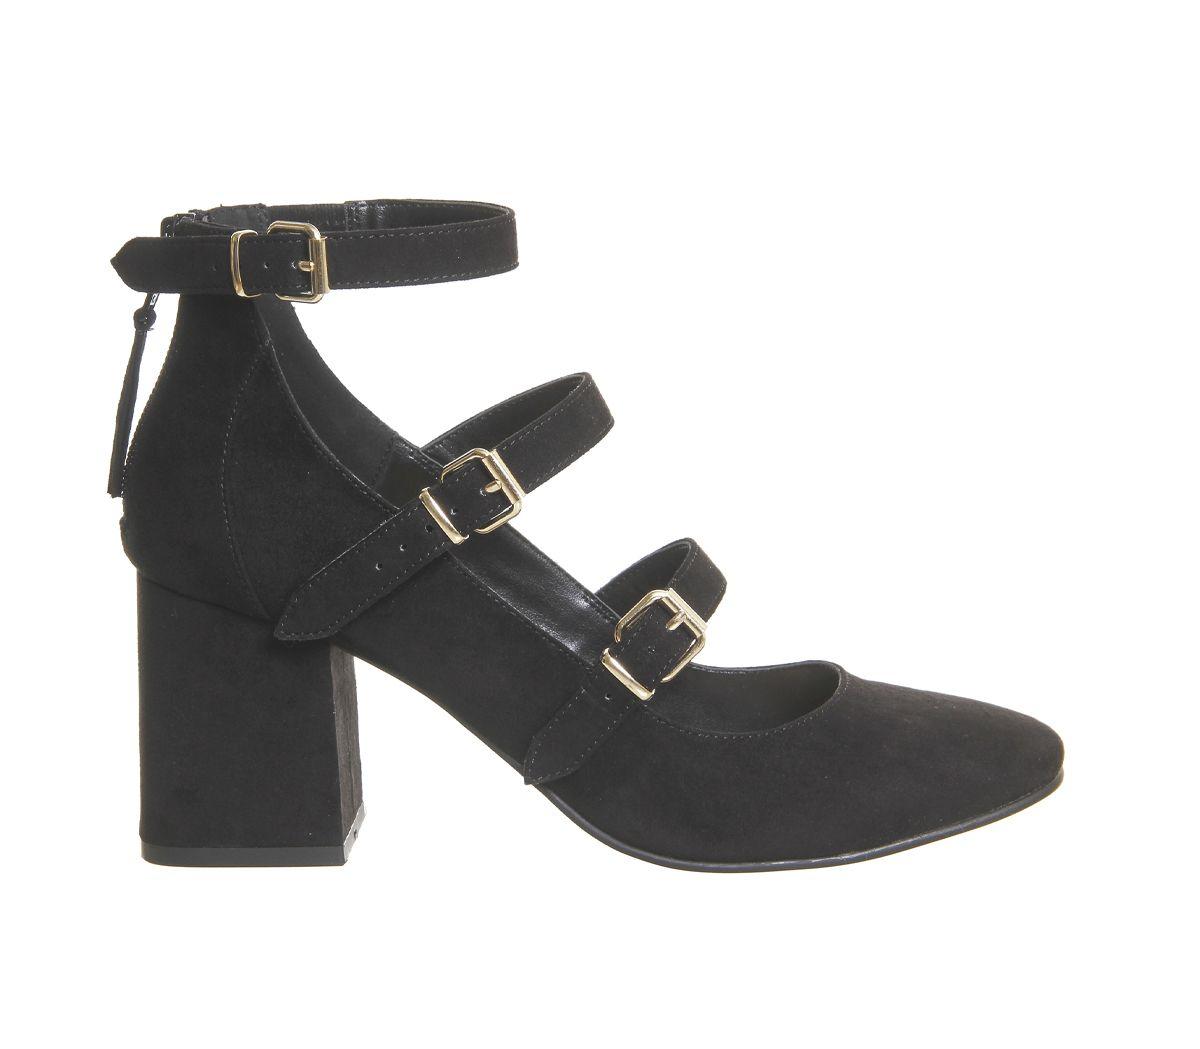 5cddecb49cf Office Flirt Three Strap Block Heels Black - Mid Heels